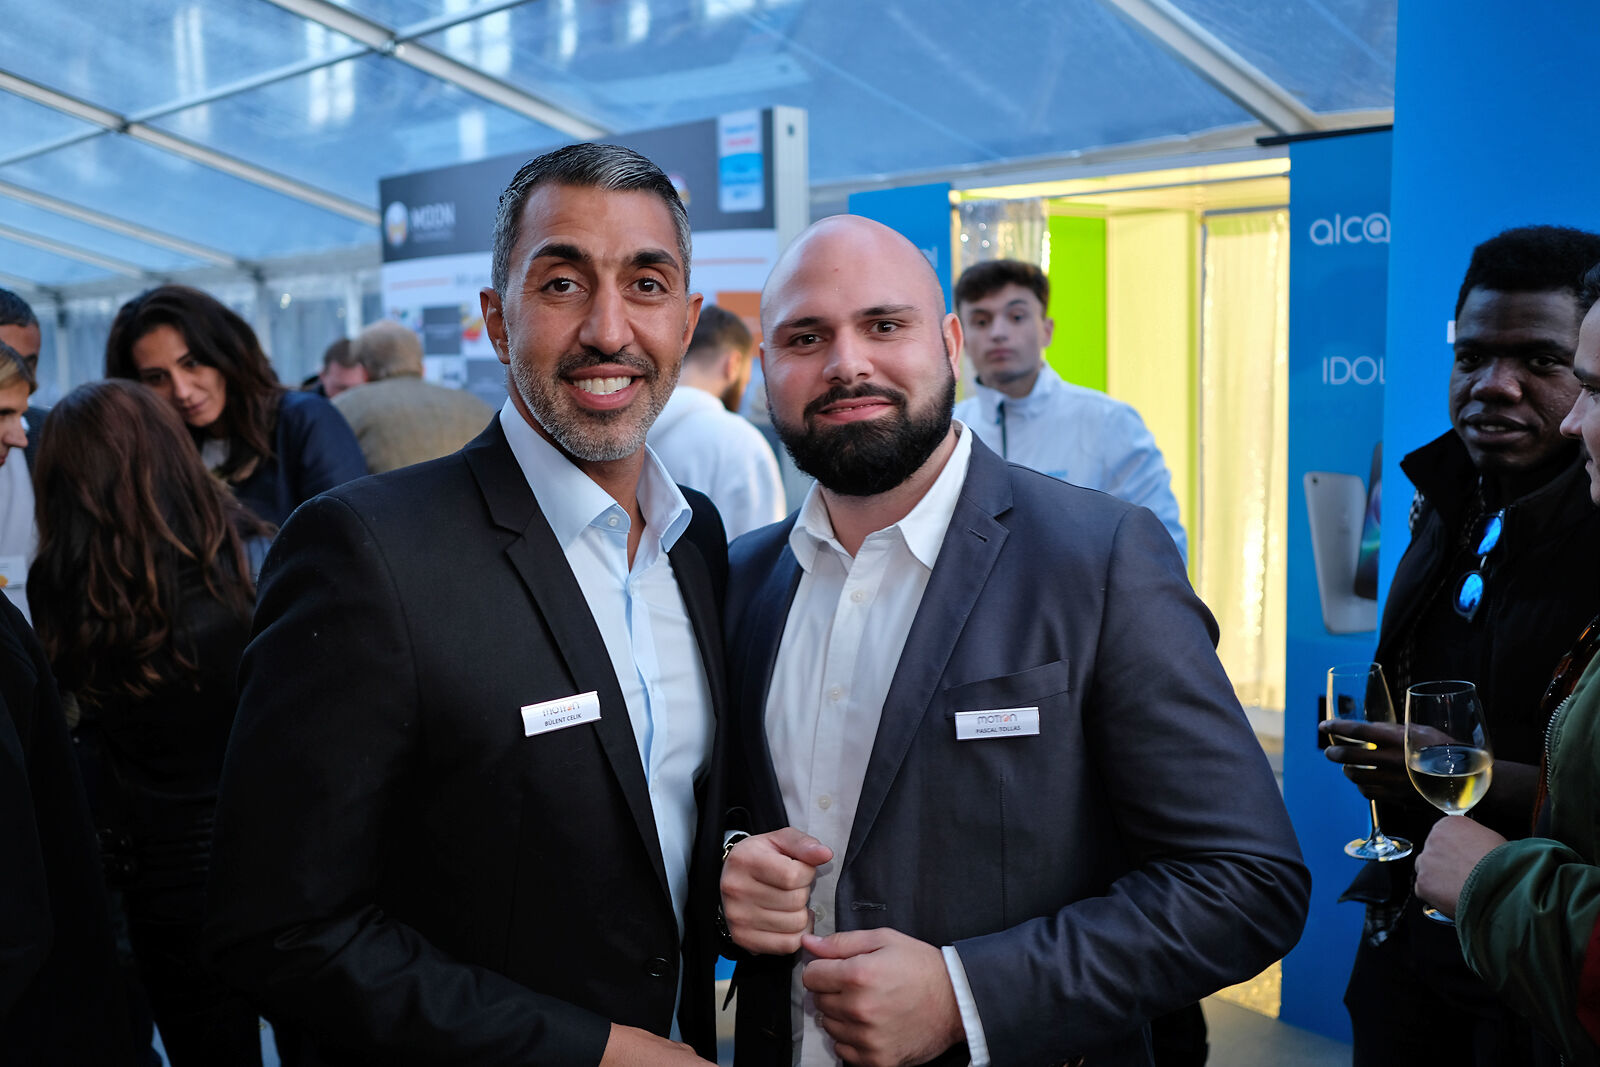 Kaufmann/-frau im E-Commerce (m/w/d) Ausbildung - Job Troisdorf - Wir suchen Dich - MOTION TM Vertriebs GmbH